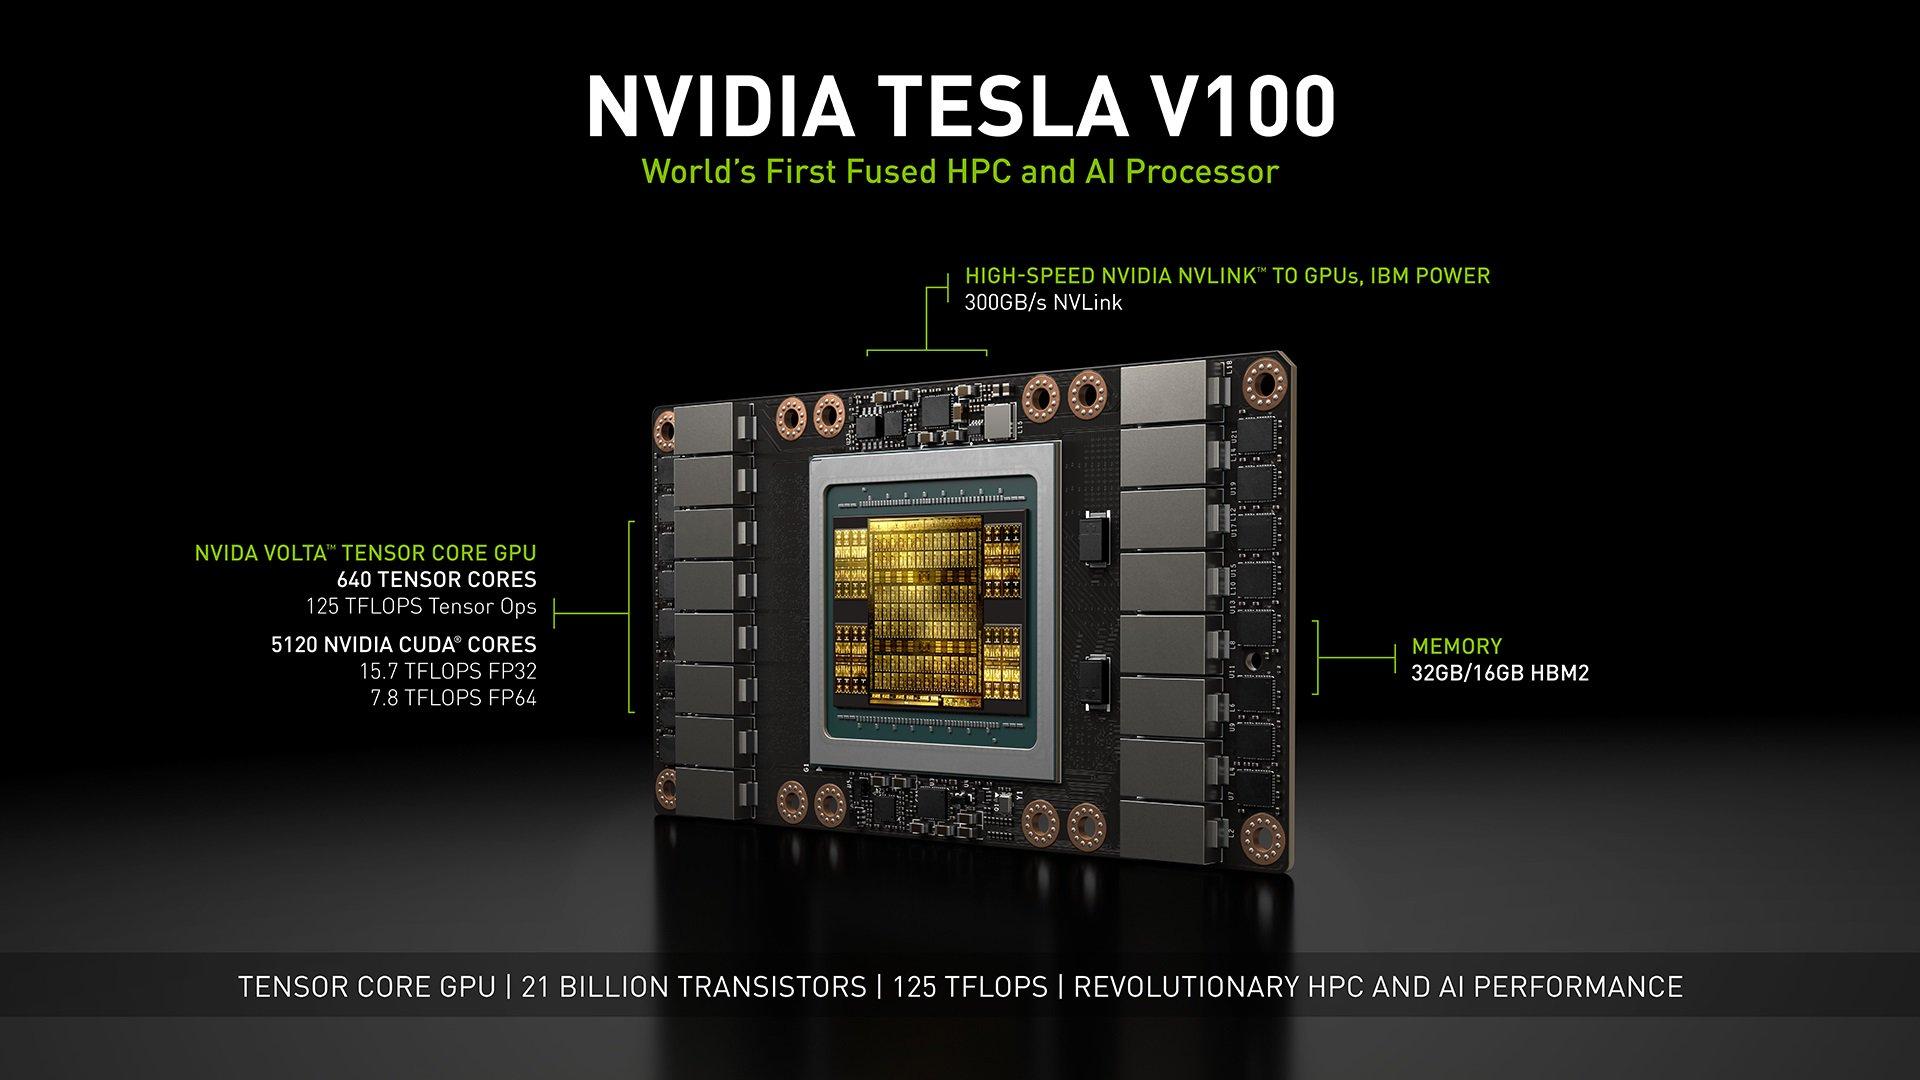 procesor Tesla V100 od NVIDIA